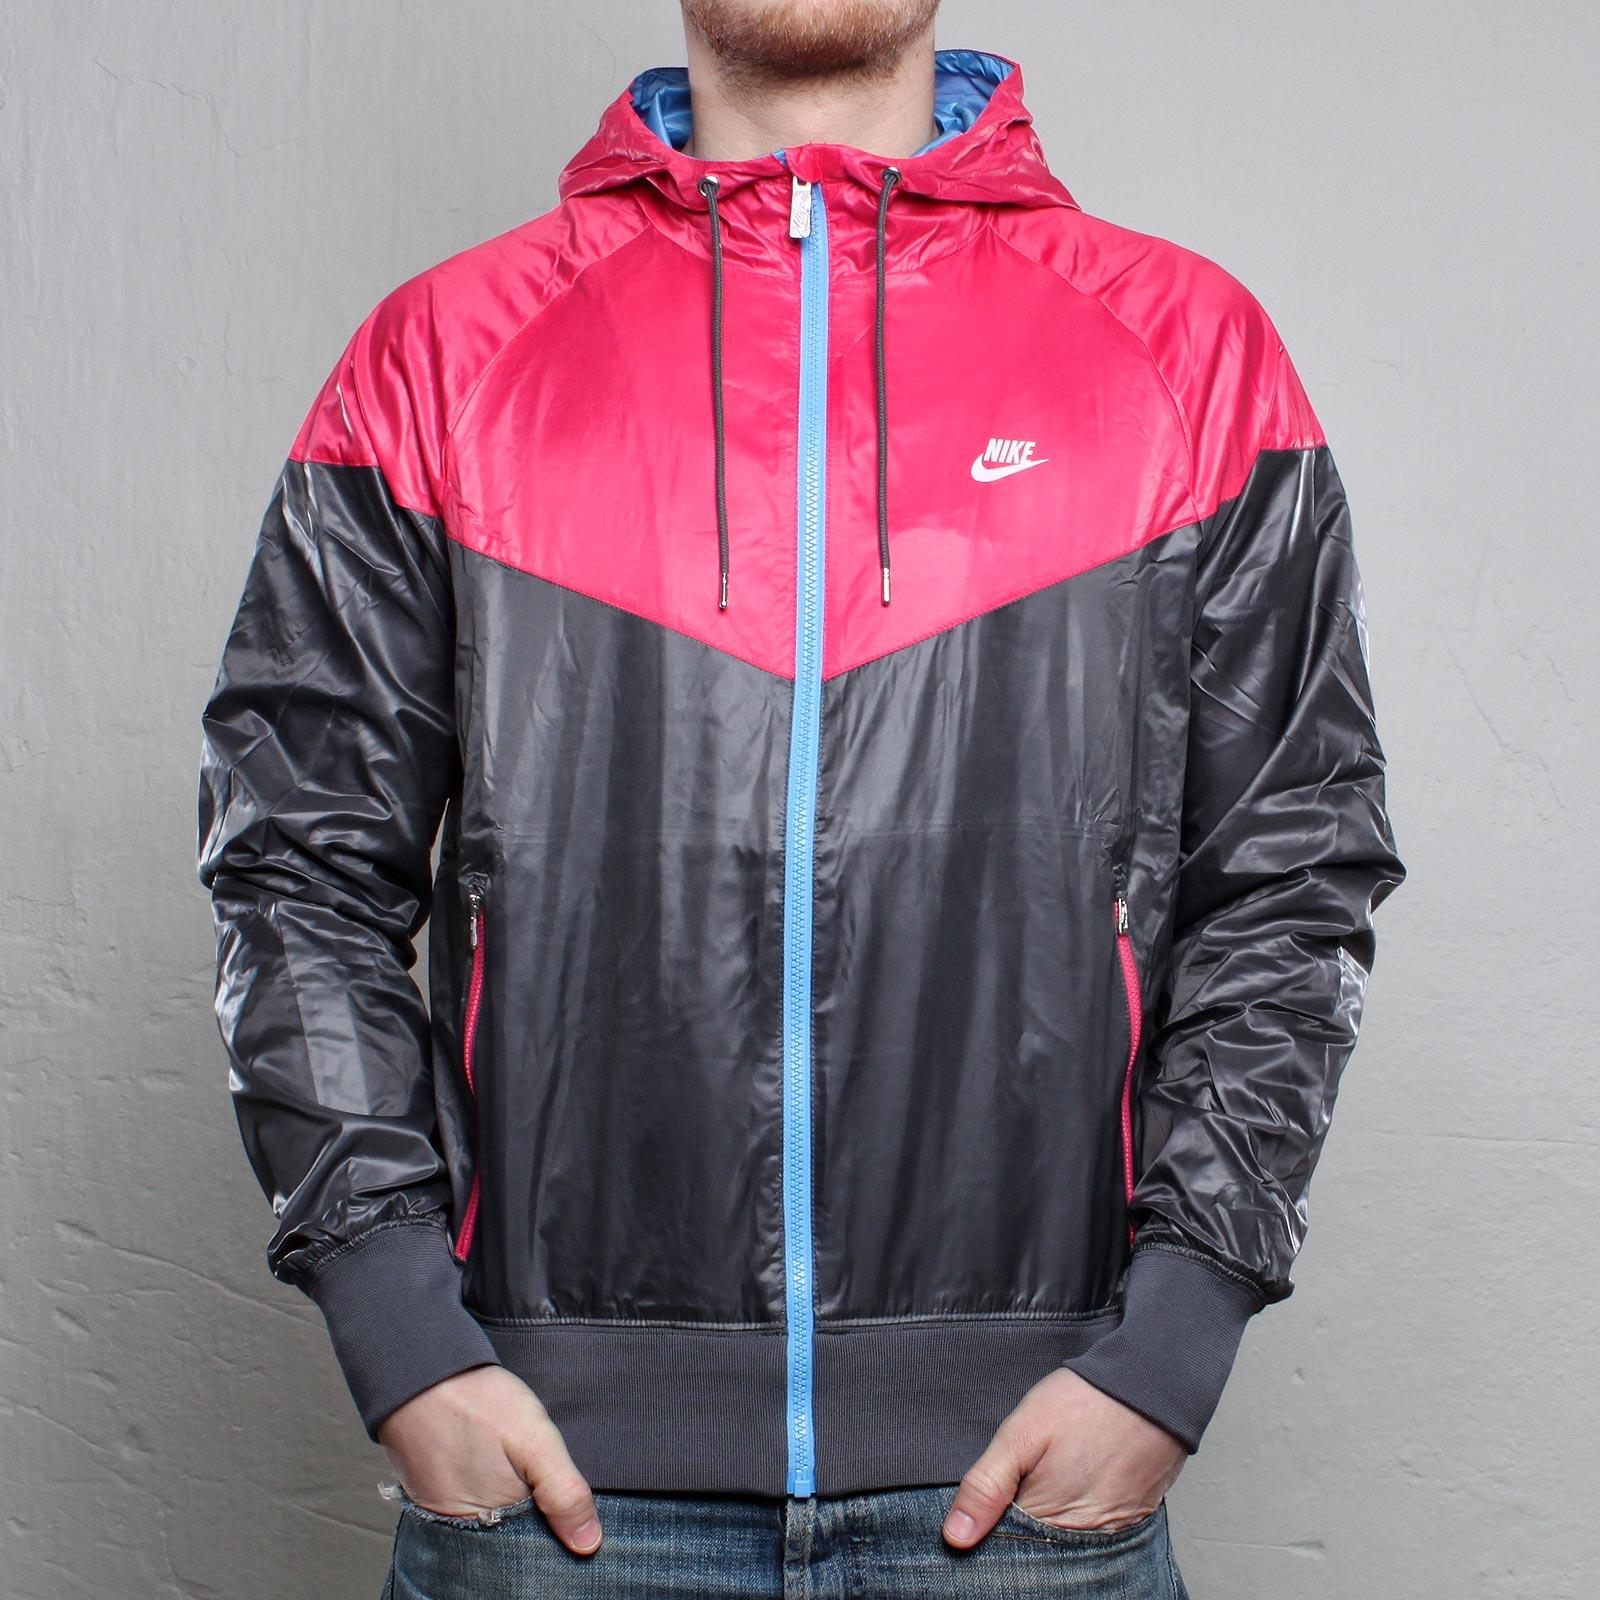 Nike Windrunner Jacket - 100148 - Sneakersnstuff  f09caeadb